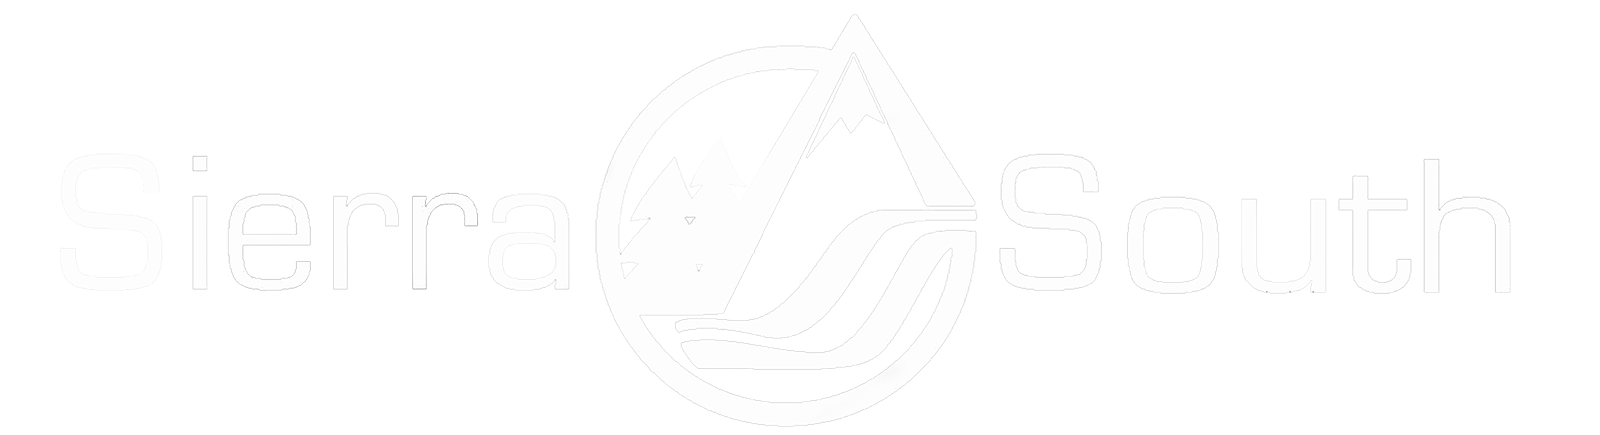 Sierra South Store